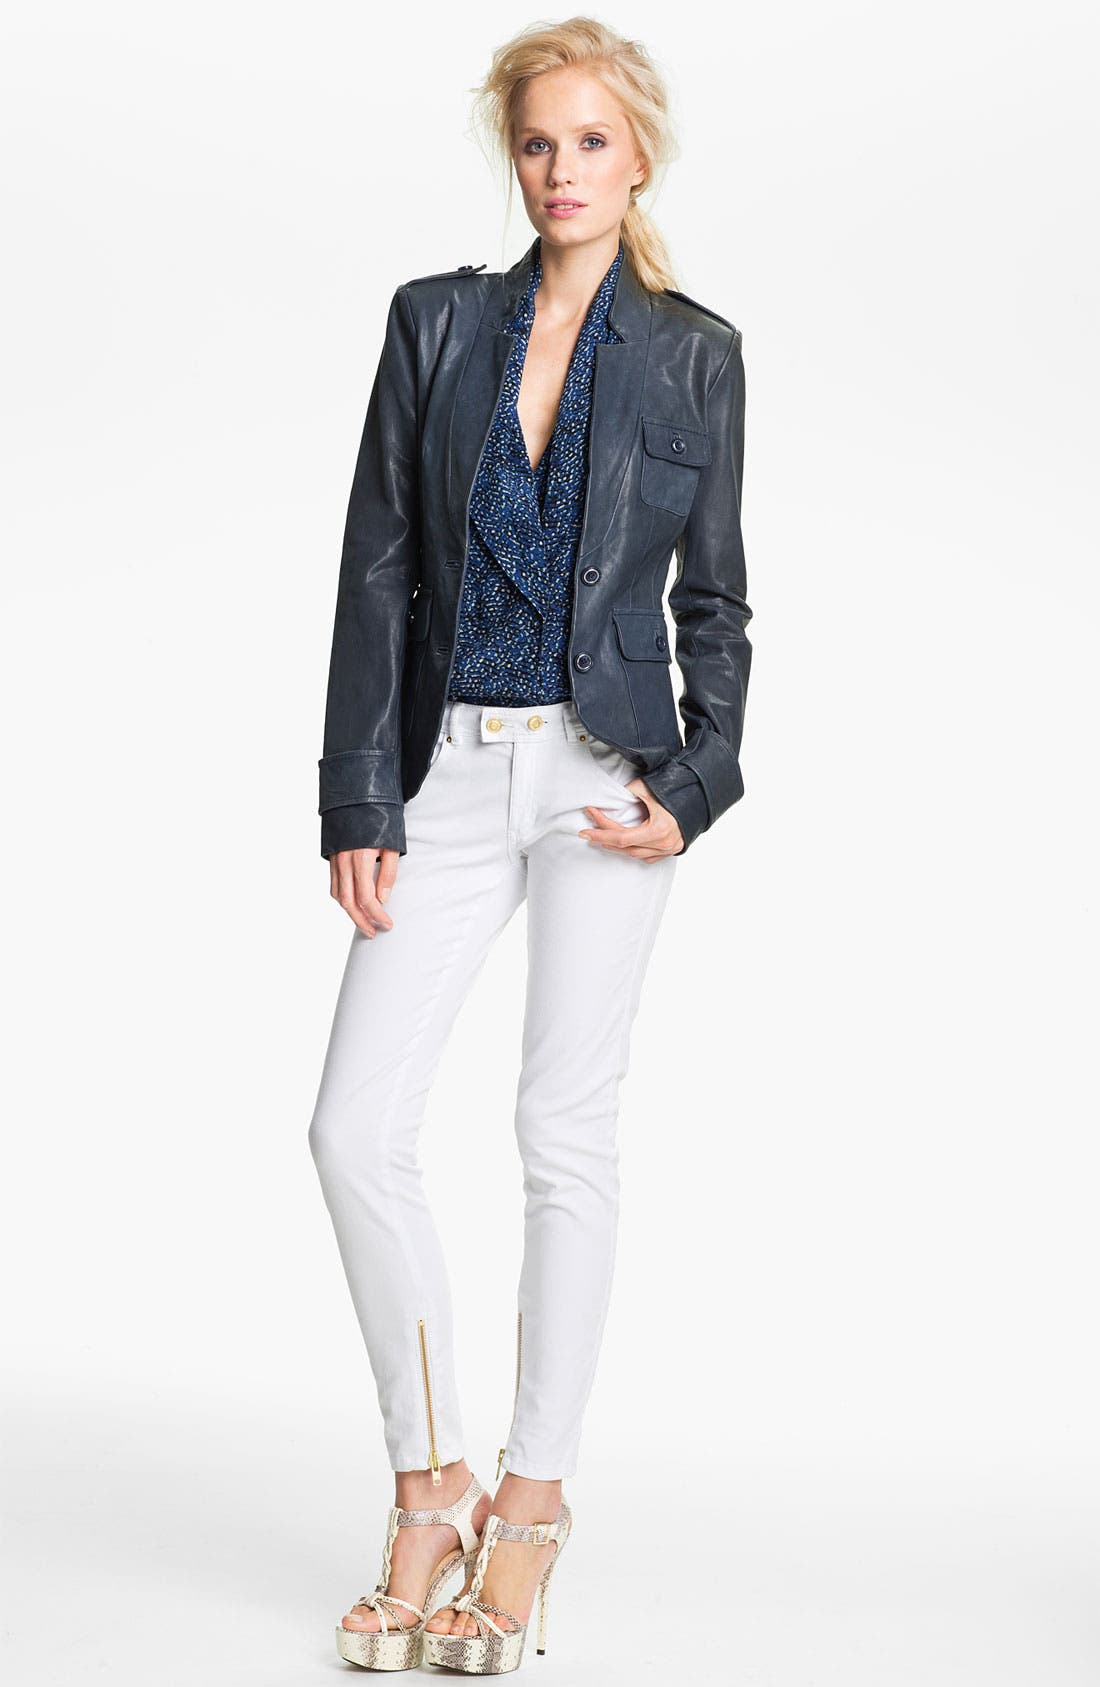 Main Image - Rachel Zoe 'Finn' Leather Jacket